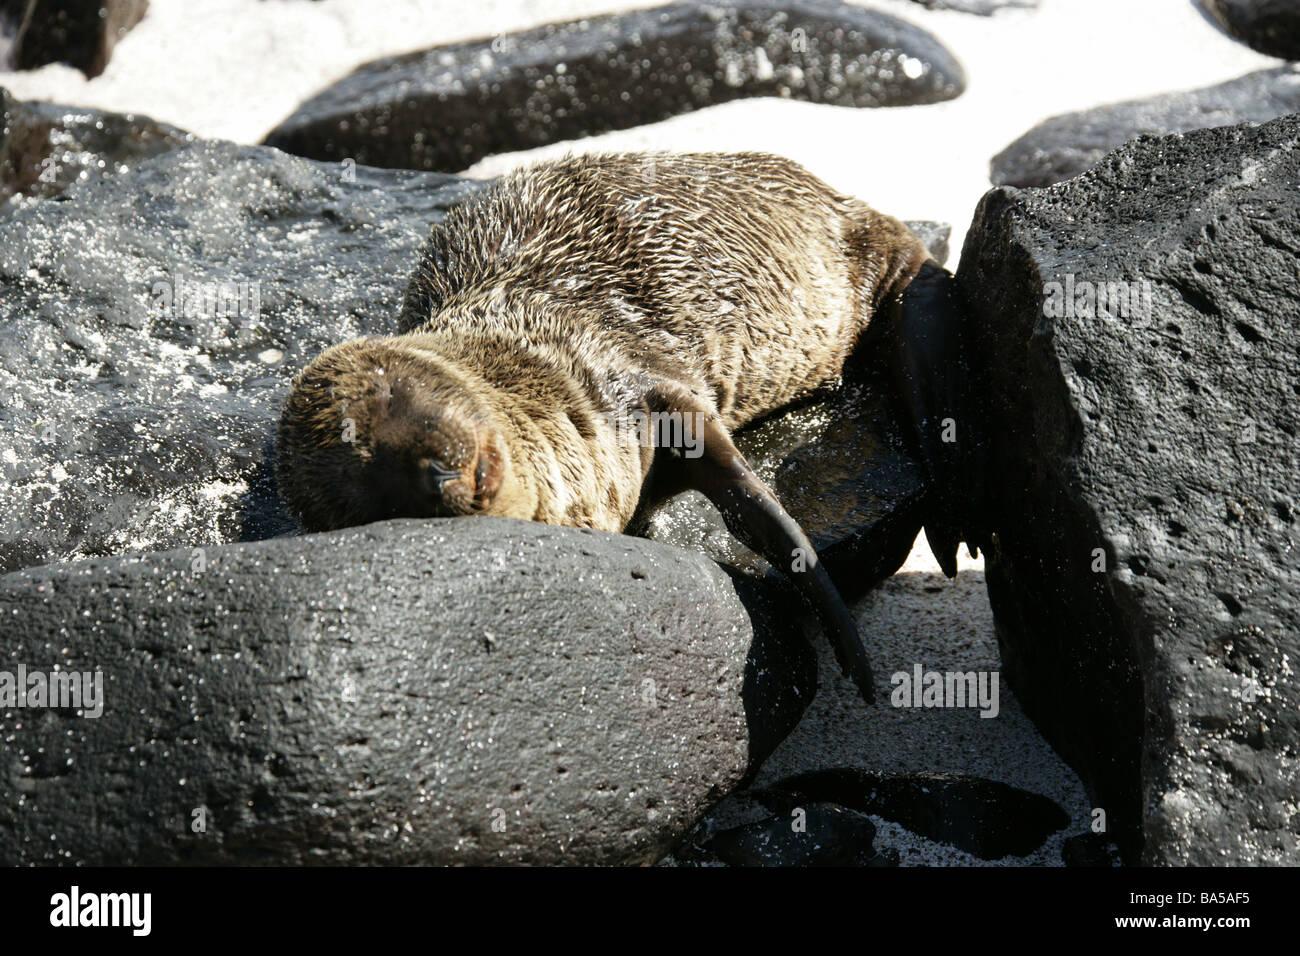 Sleeping Galapagos Sea Lion, Zalophus wollebaeki, Espanola Island, Galapagos Archipelago, Ecuador Stock Photo